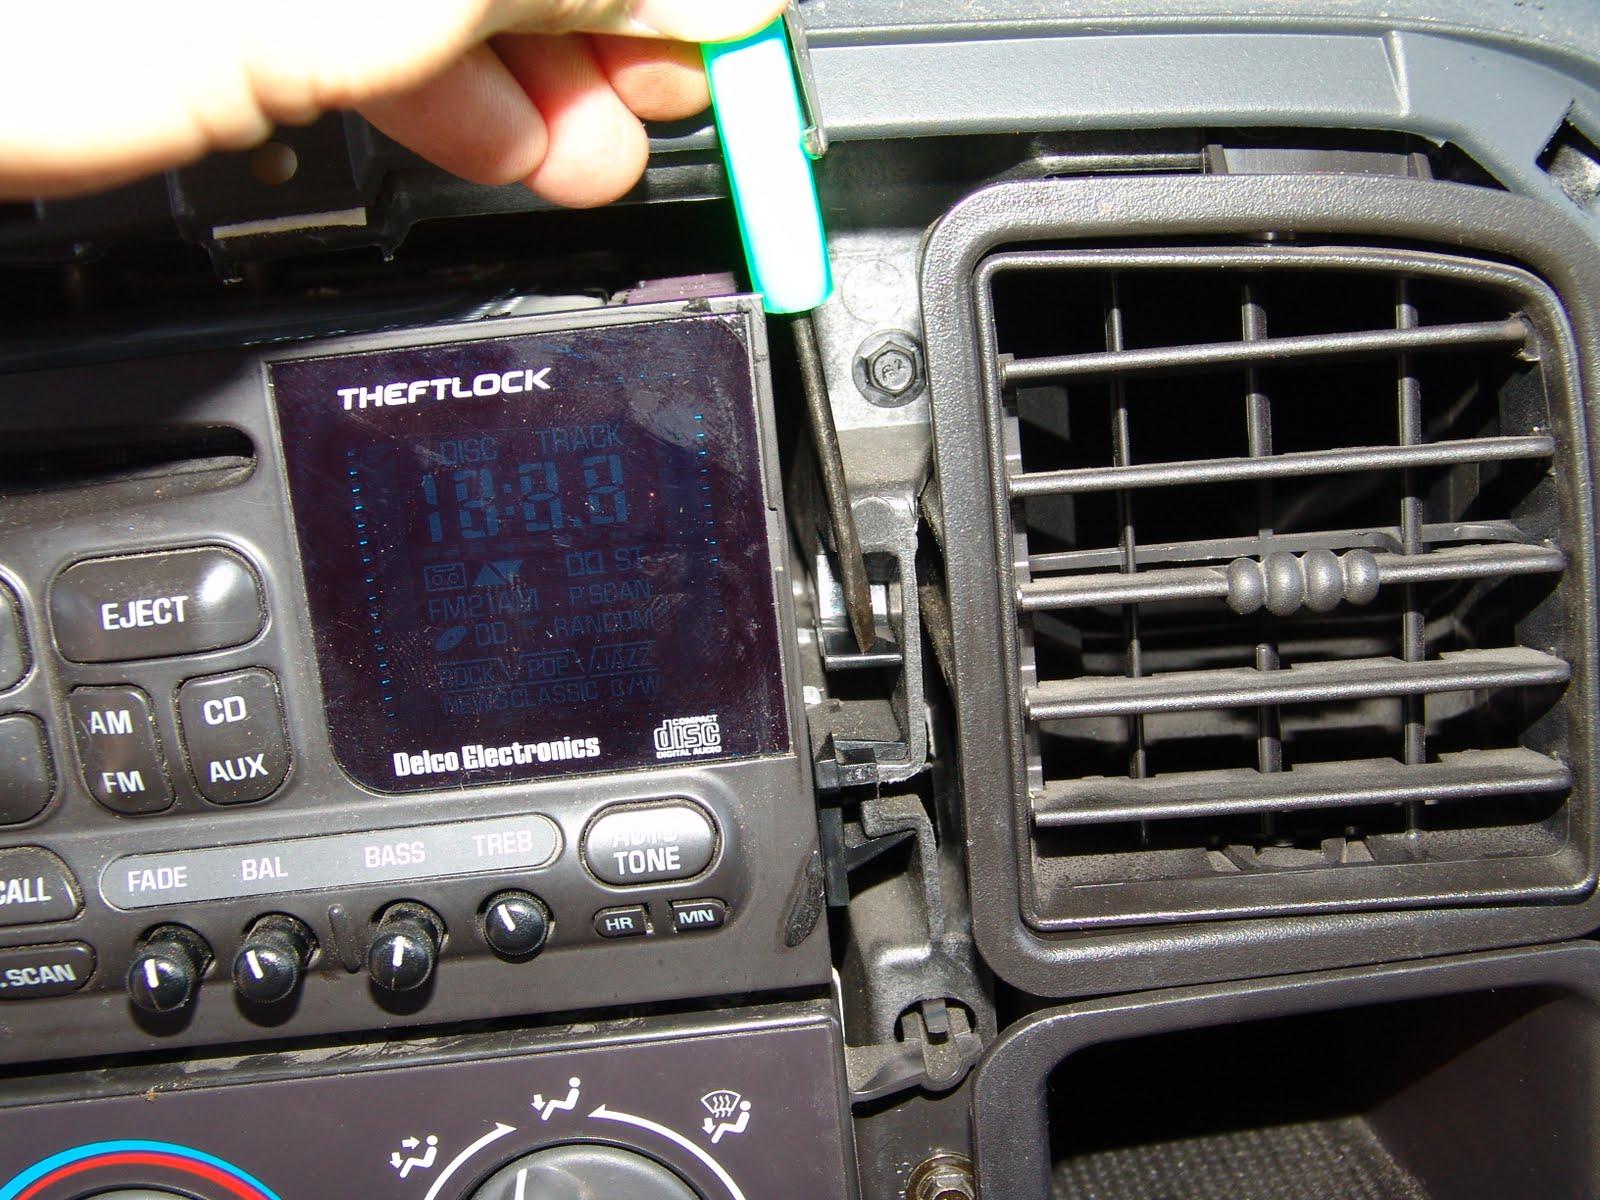 Chevy impala radio wiring diagram autos post